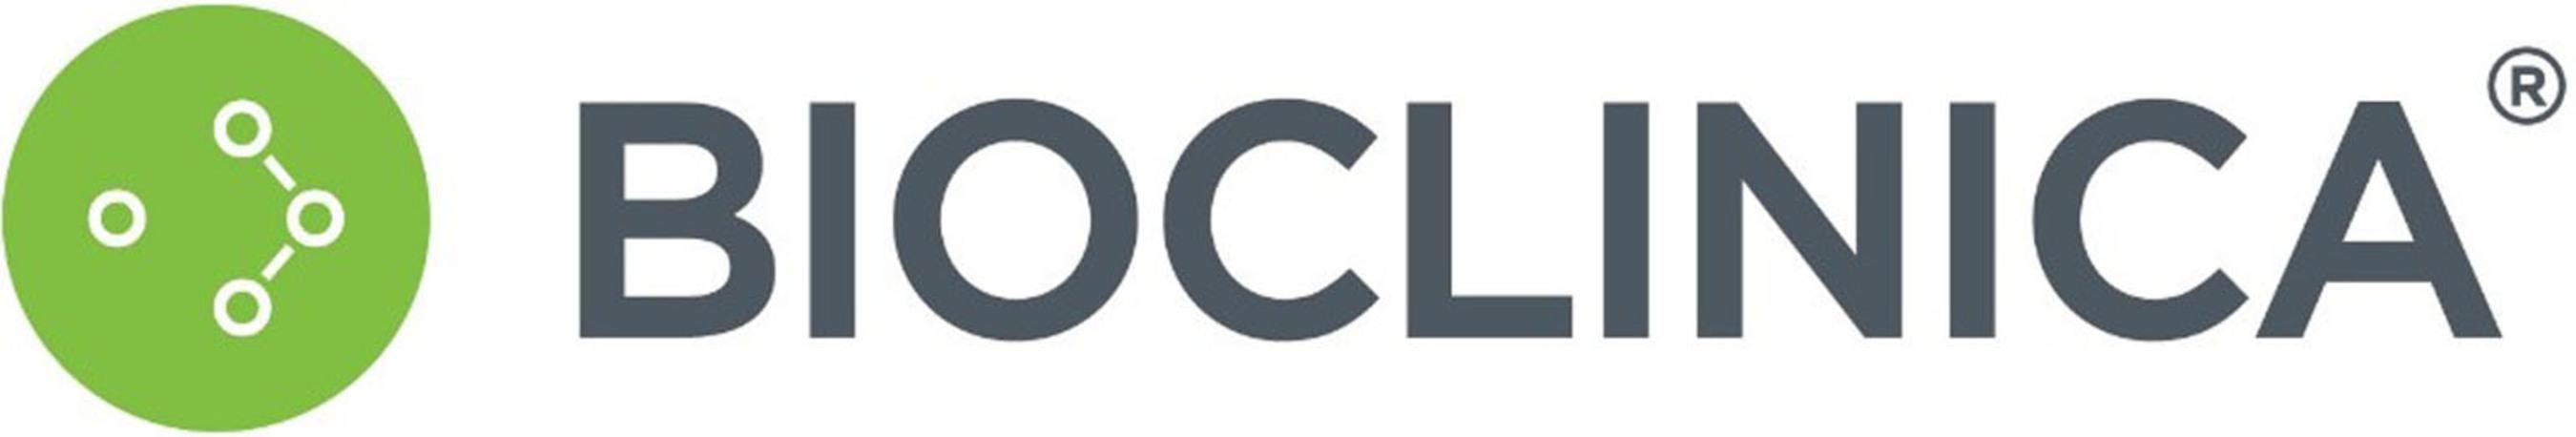 BioClinica Announces eHealth App xChange